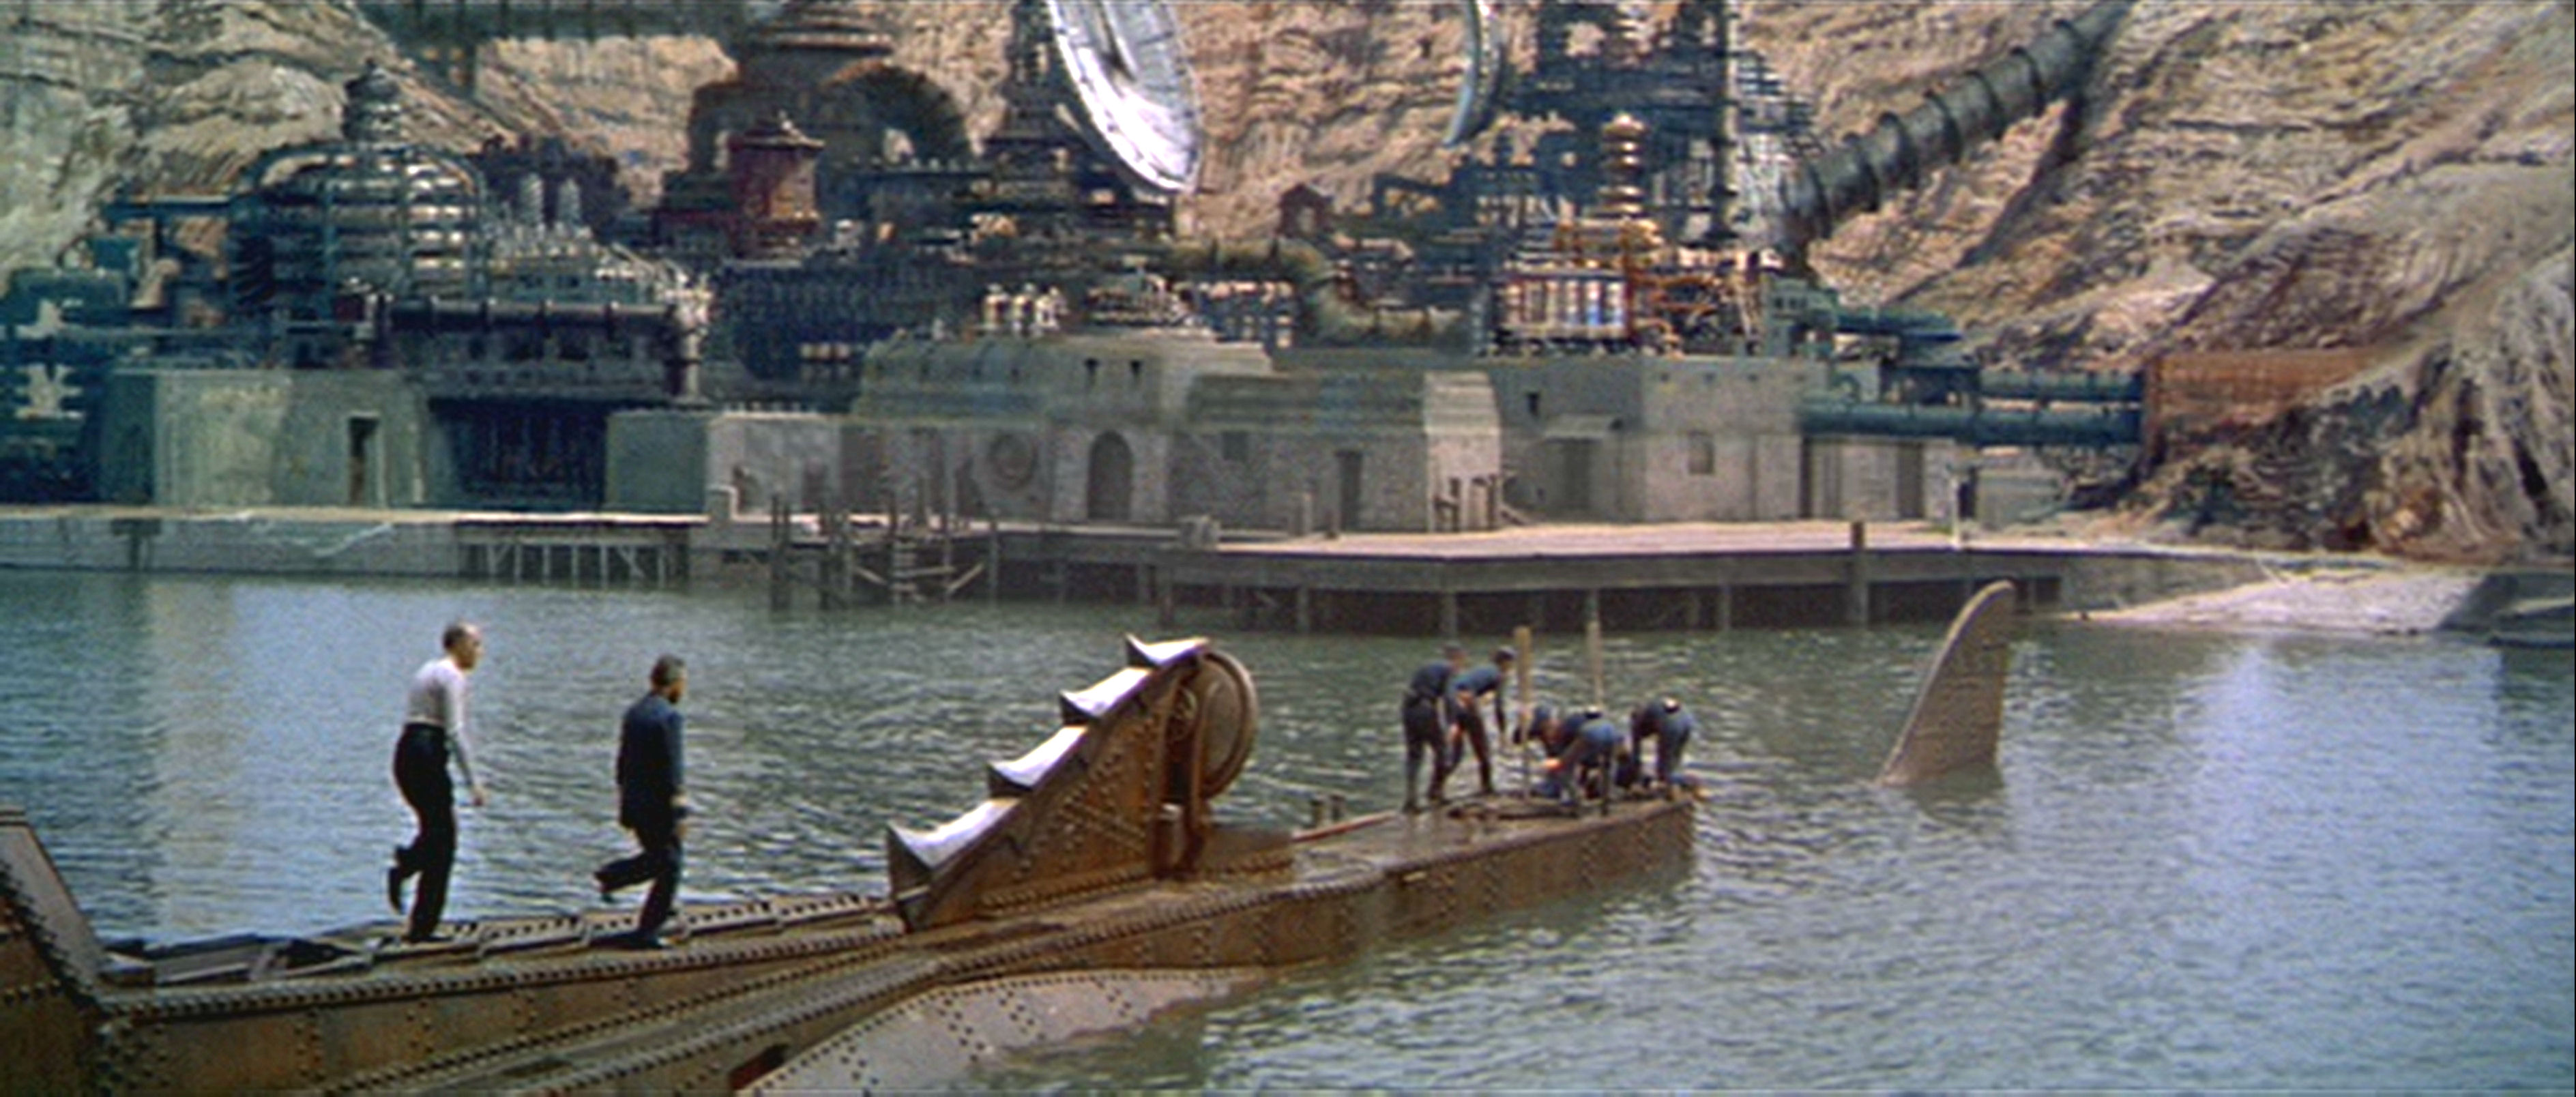 Disney Nautilus Blueprints Files 3776x1608